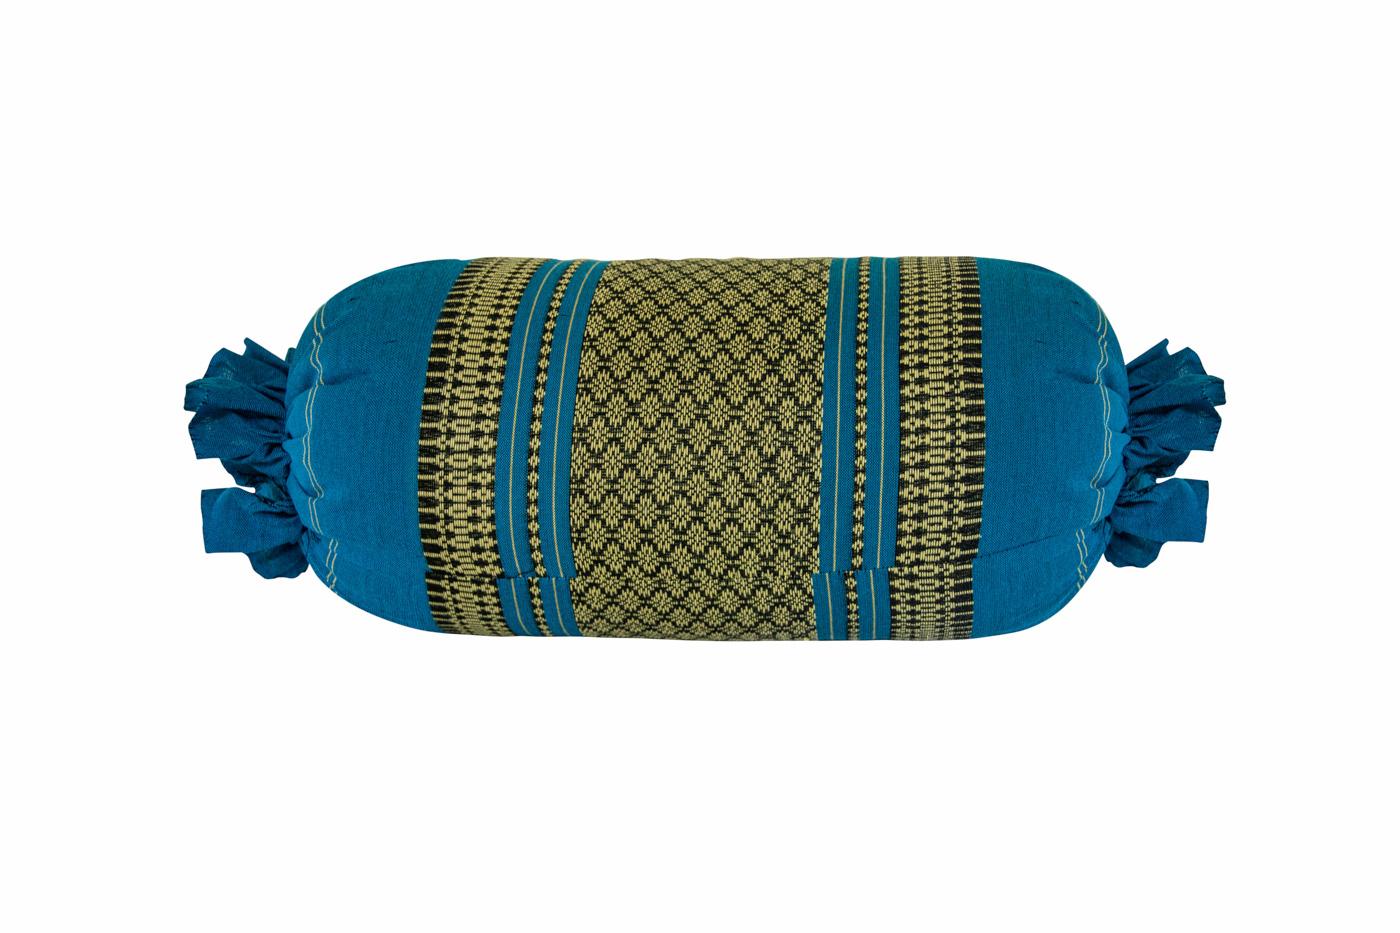 Cylindrical meditation cushion